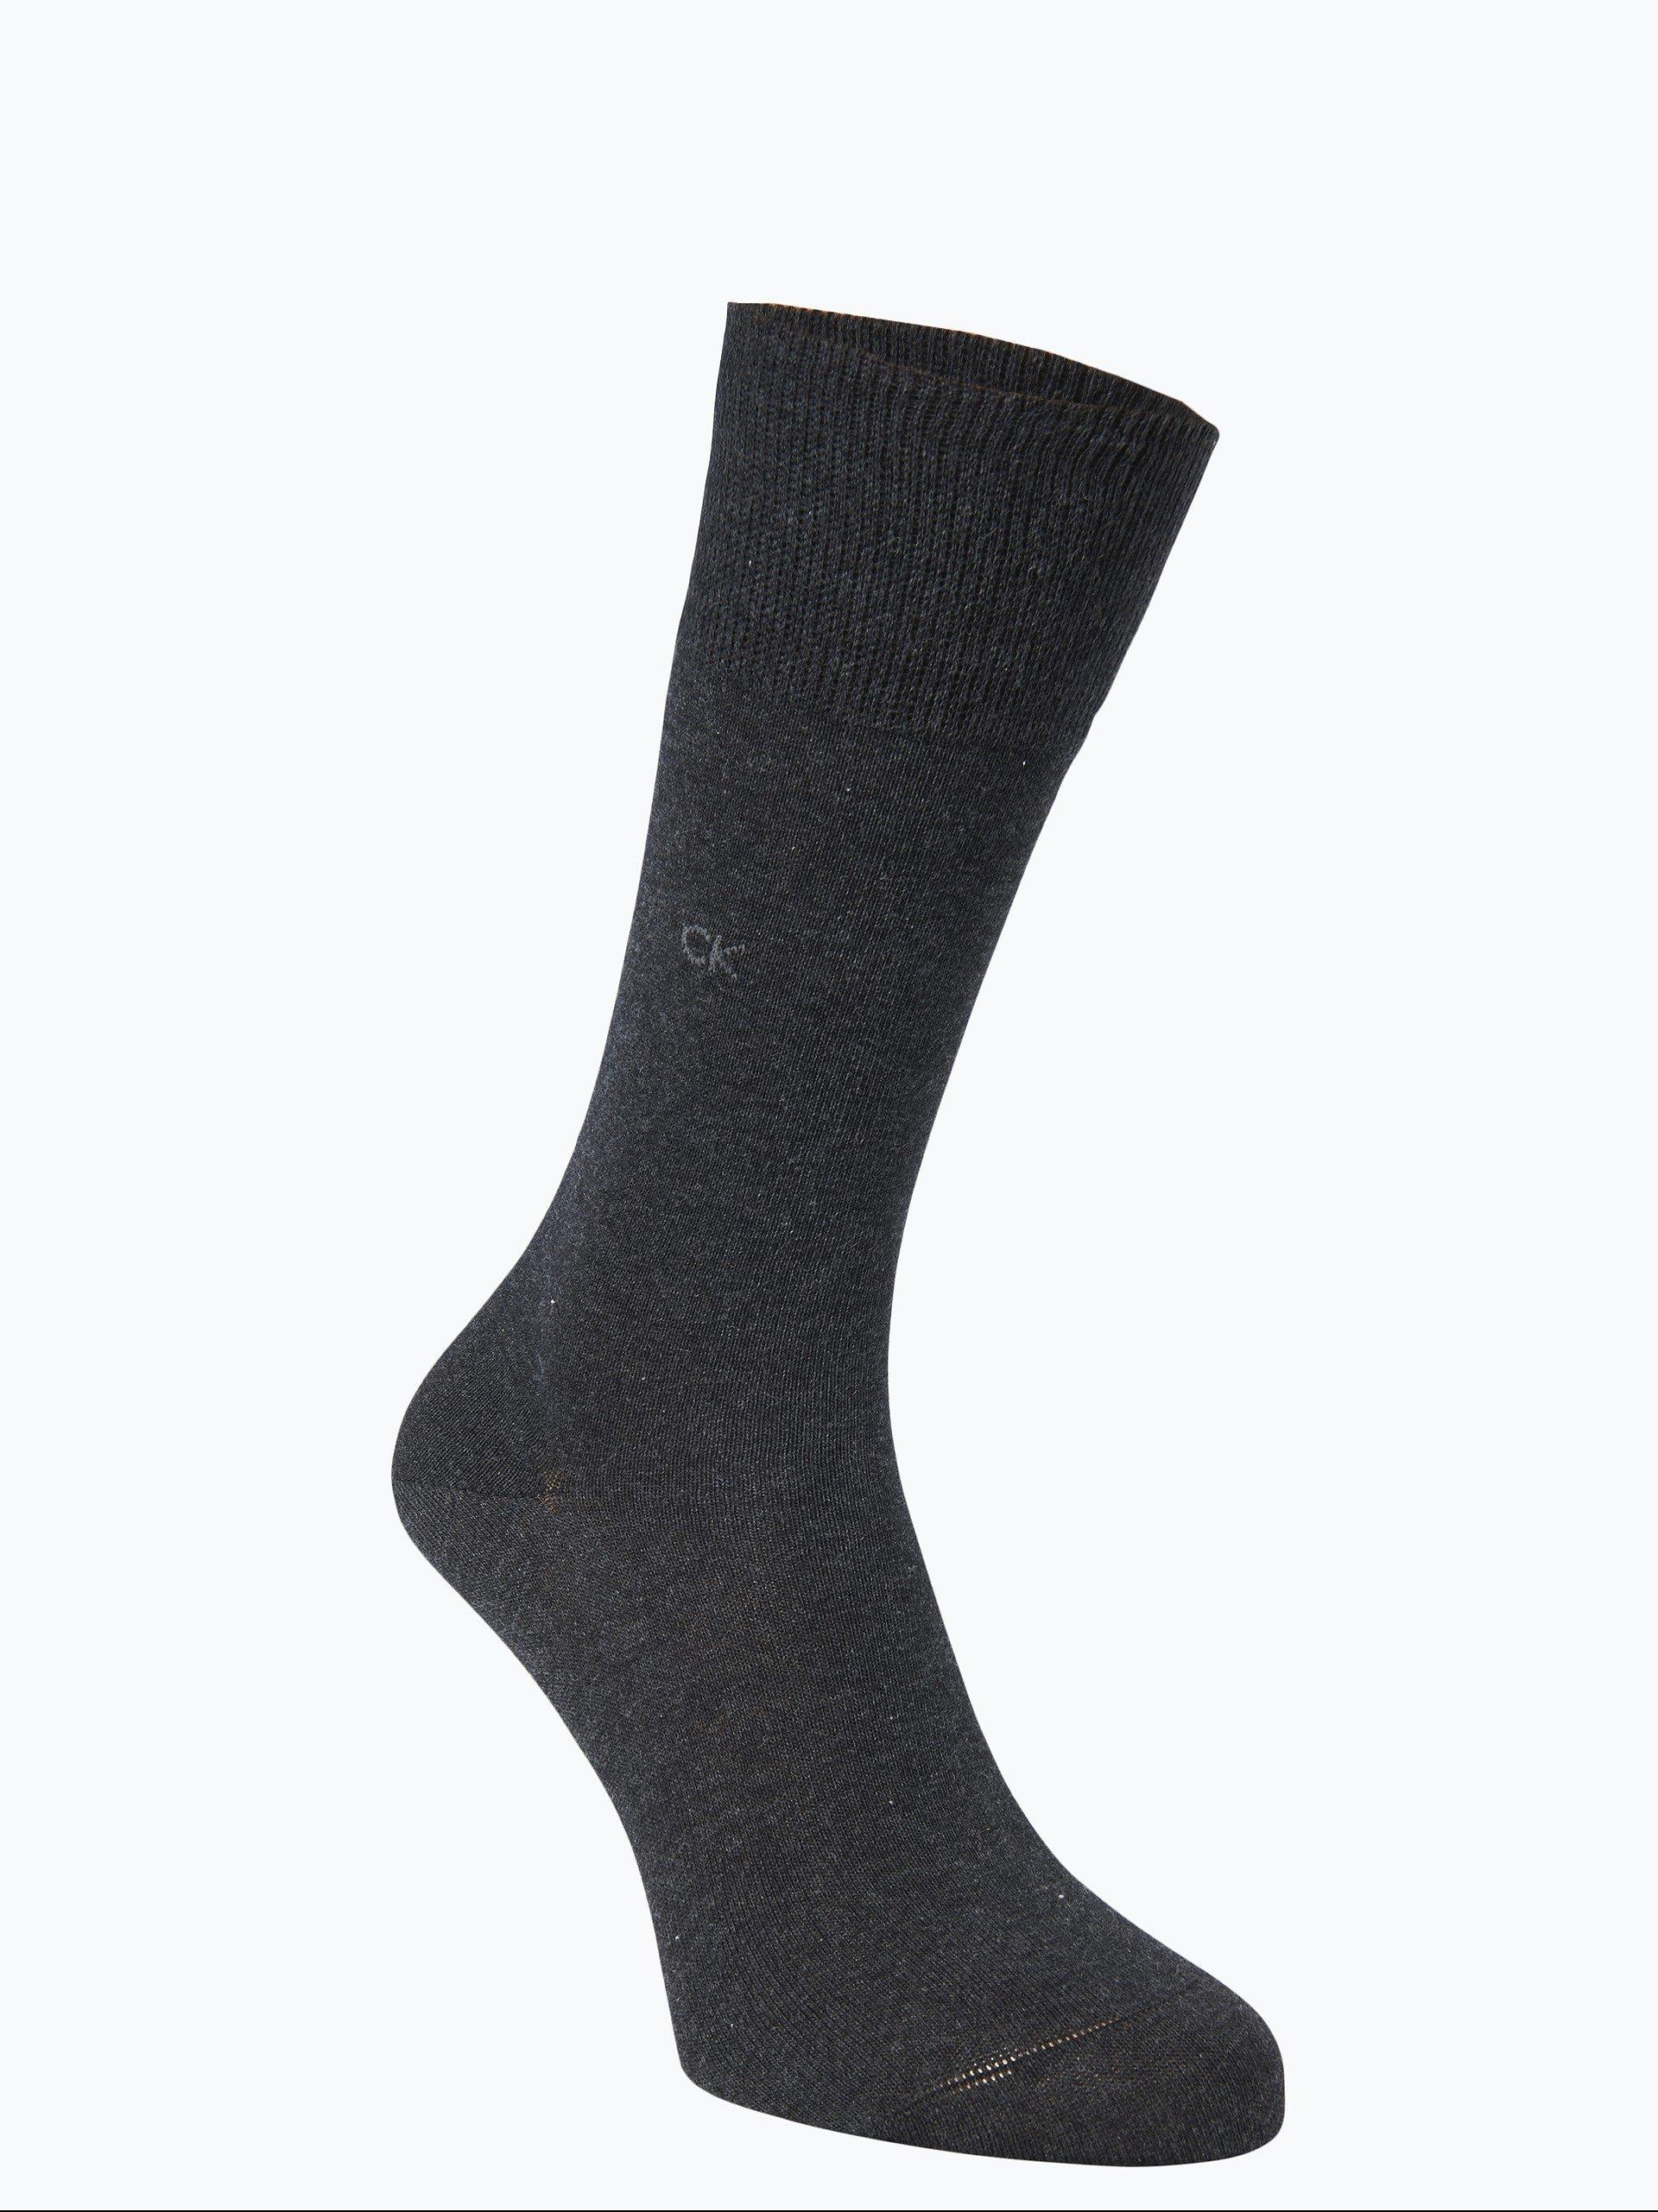 Calvin Klein Skarpety męskie pakowane po 2 szt.